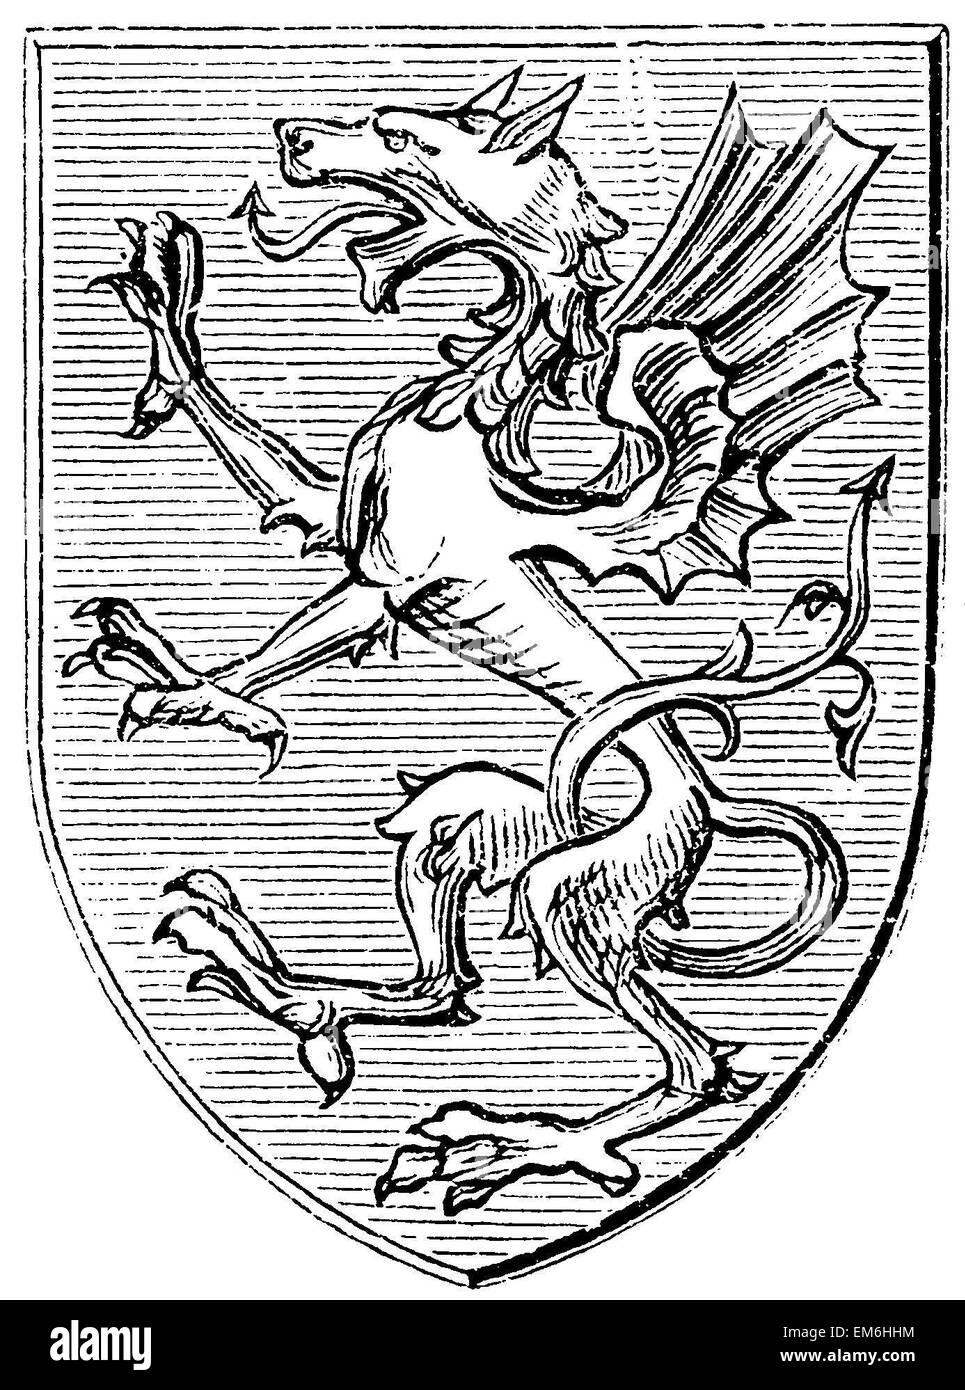 Drago araldico dal tardo Medioevo Immagini Stock